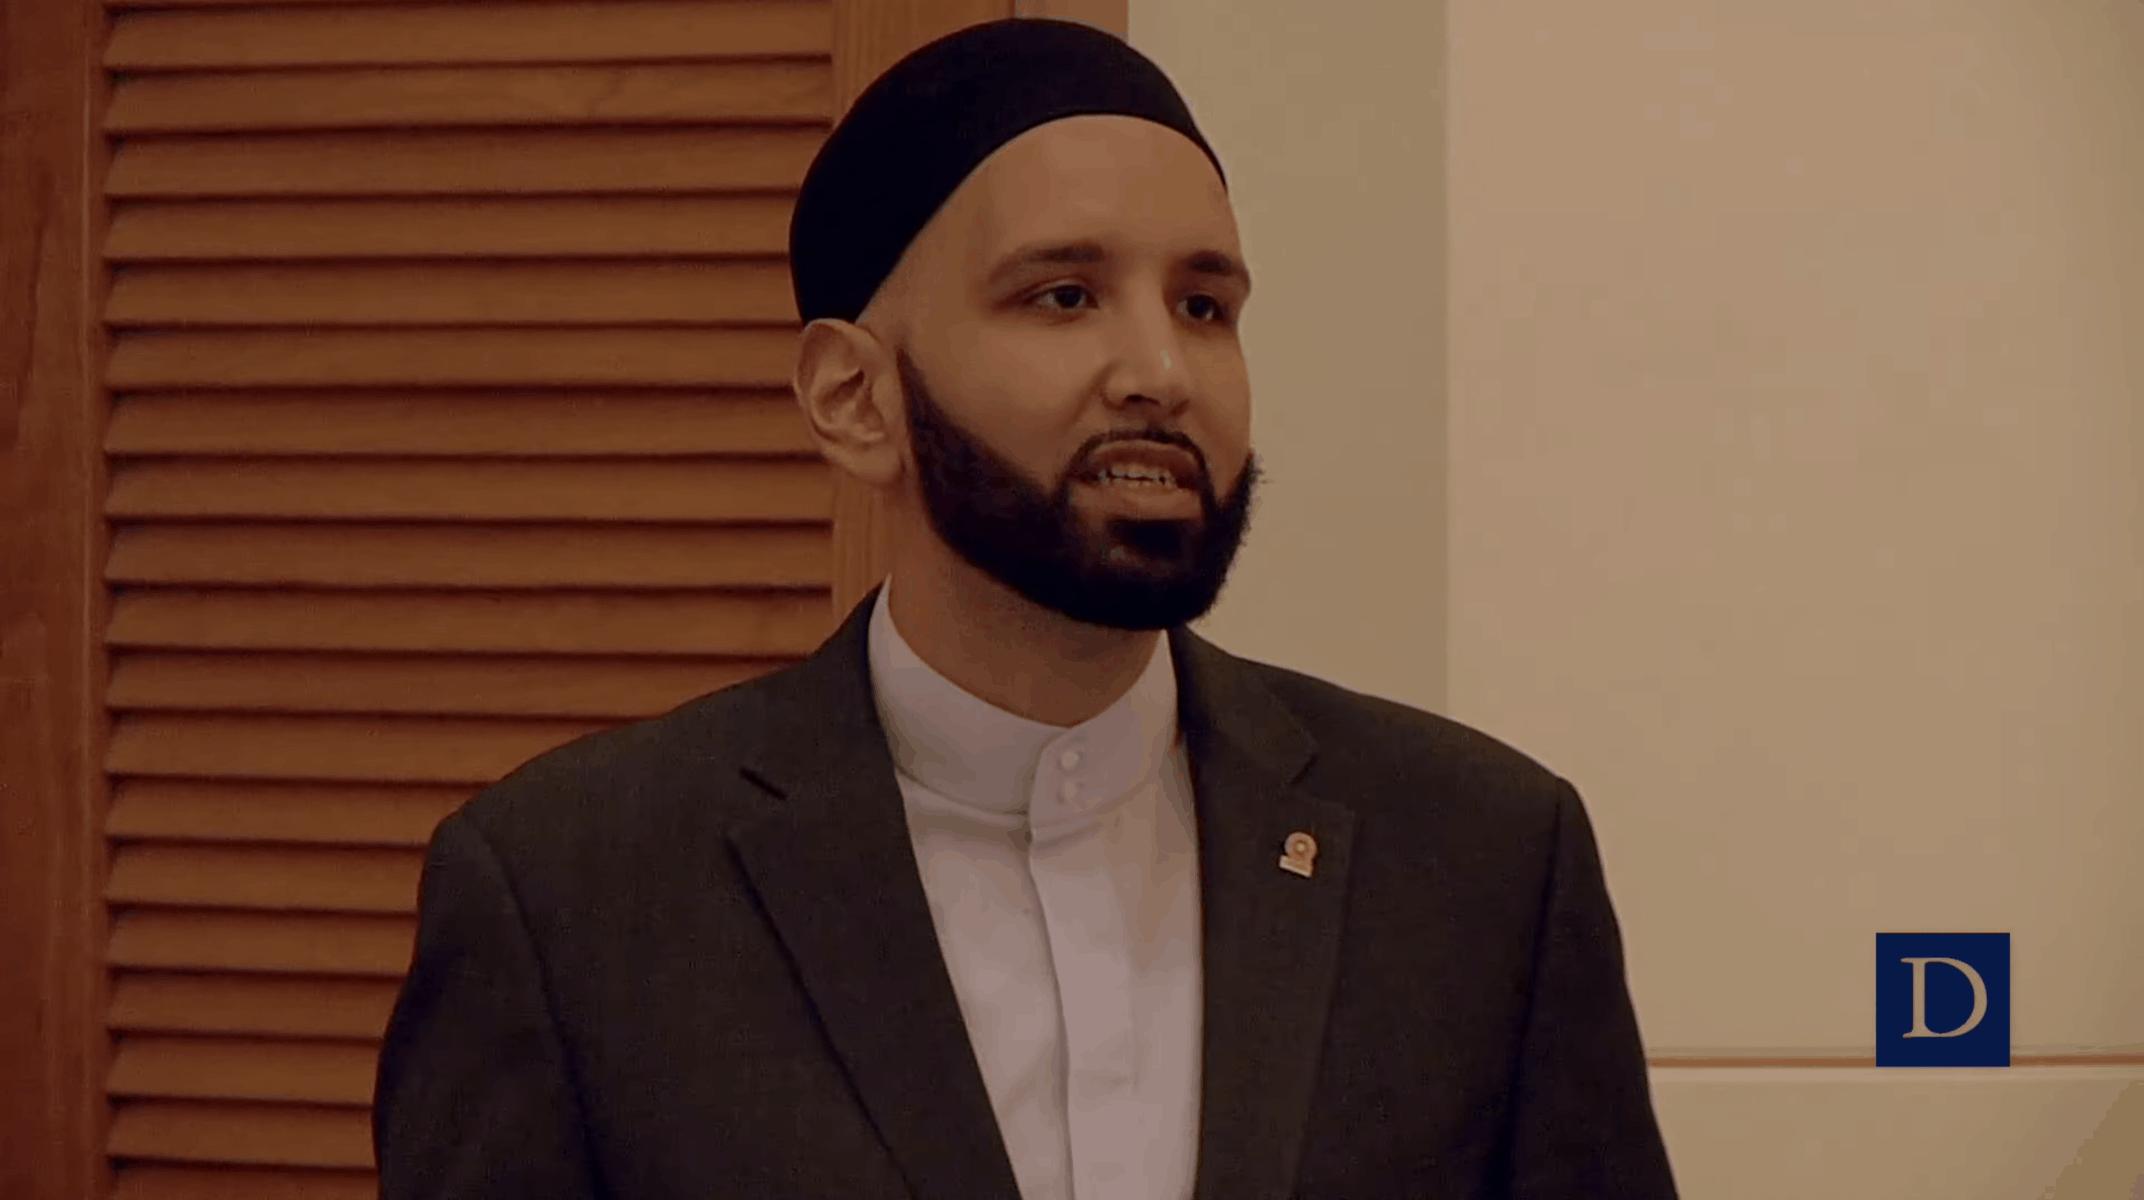 Omar Suleiman – Human Rights, Faith, and the Border